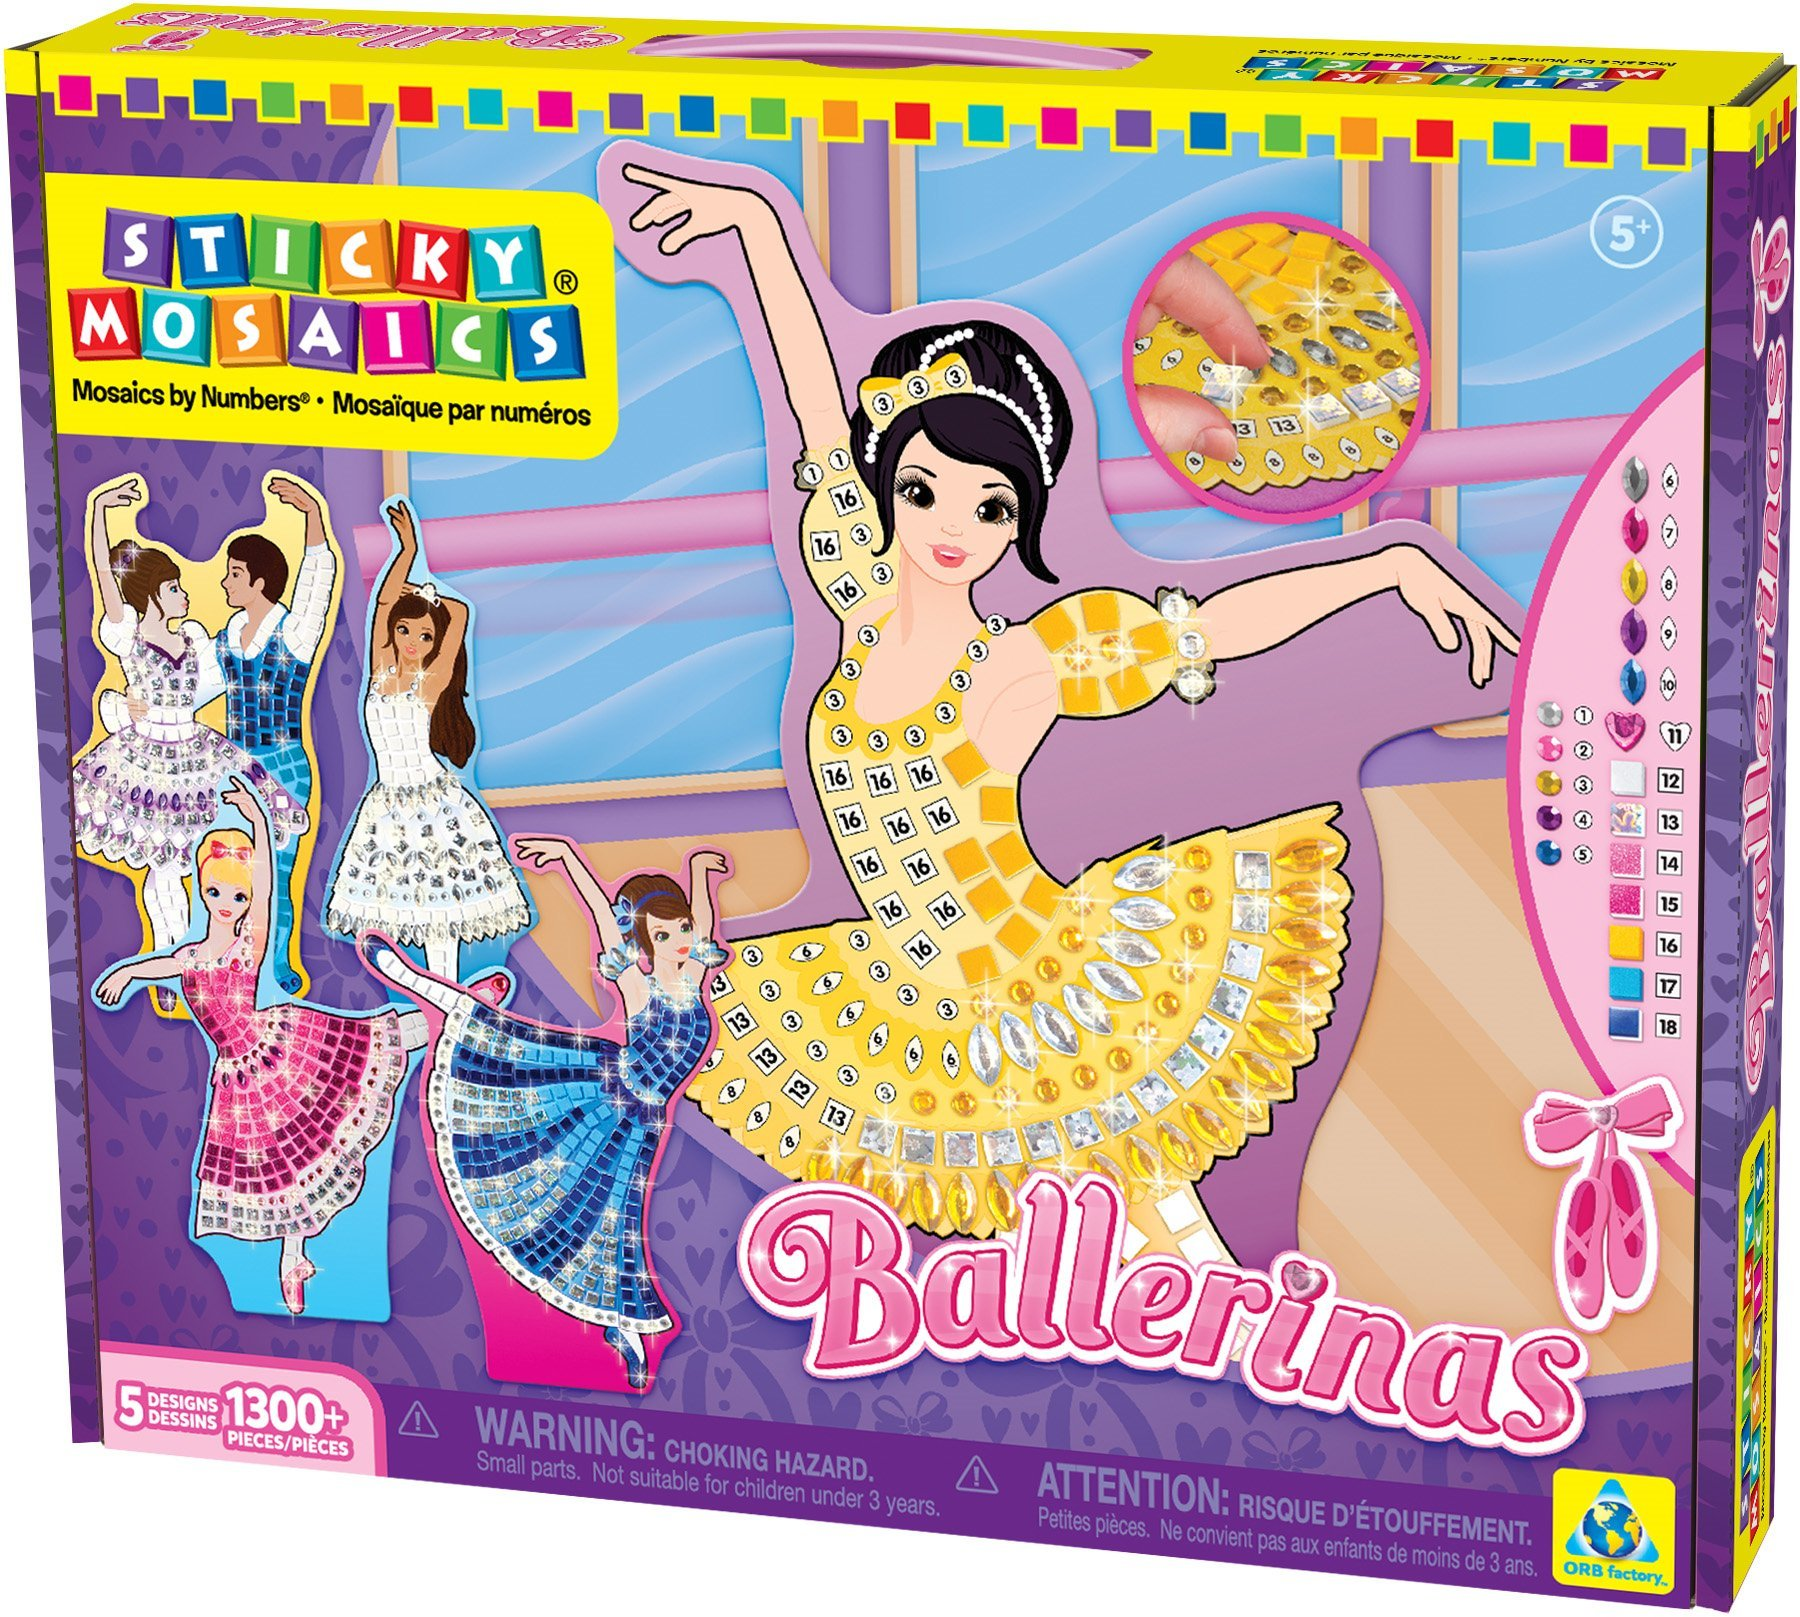 The Orb Factory Sticky Mosaics Ballerinas